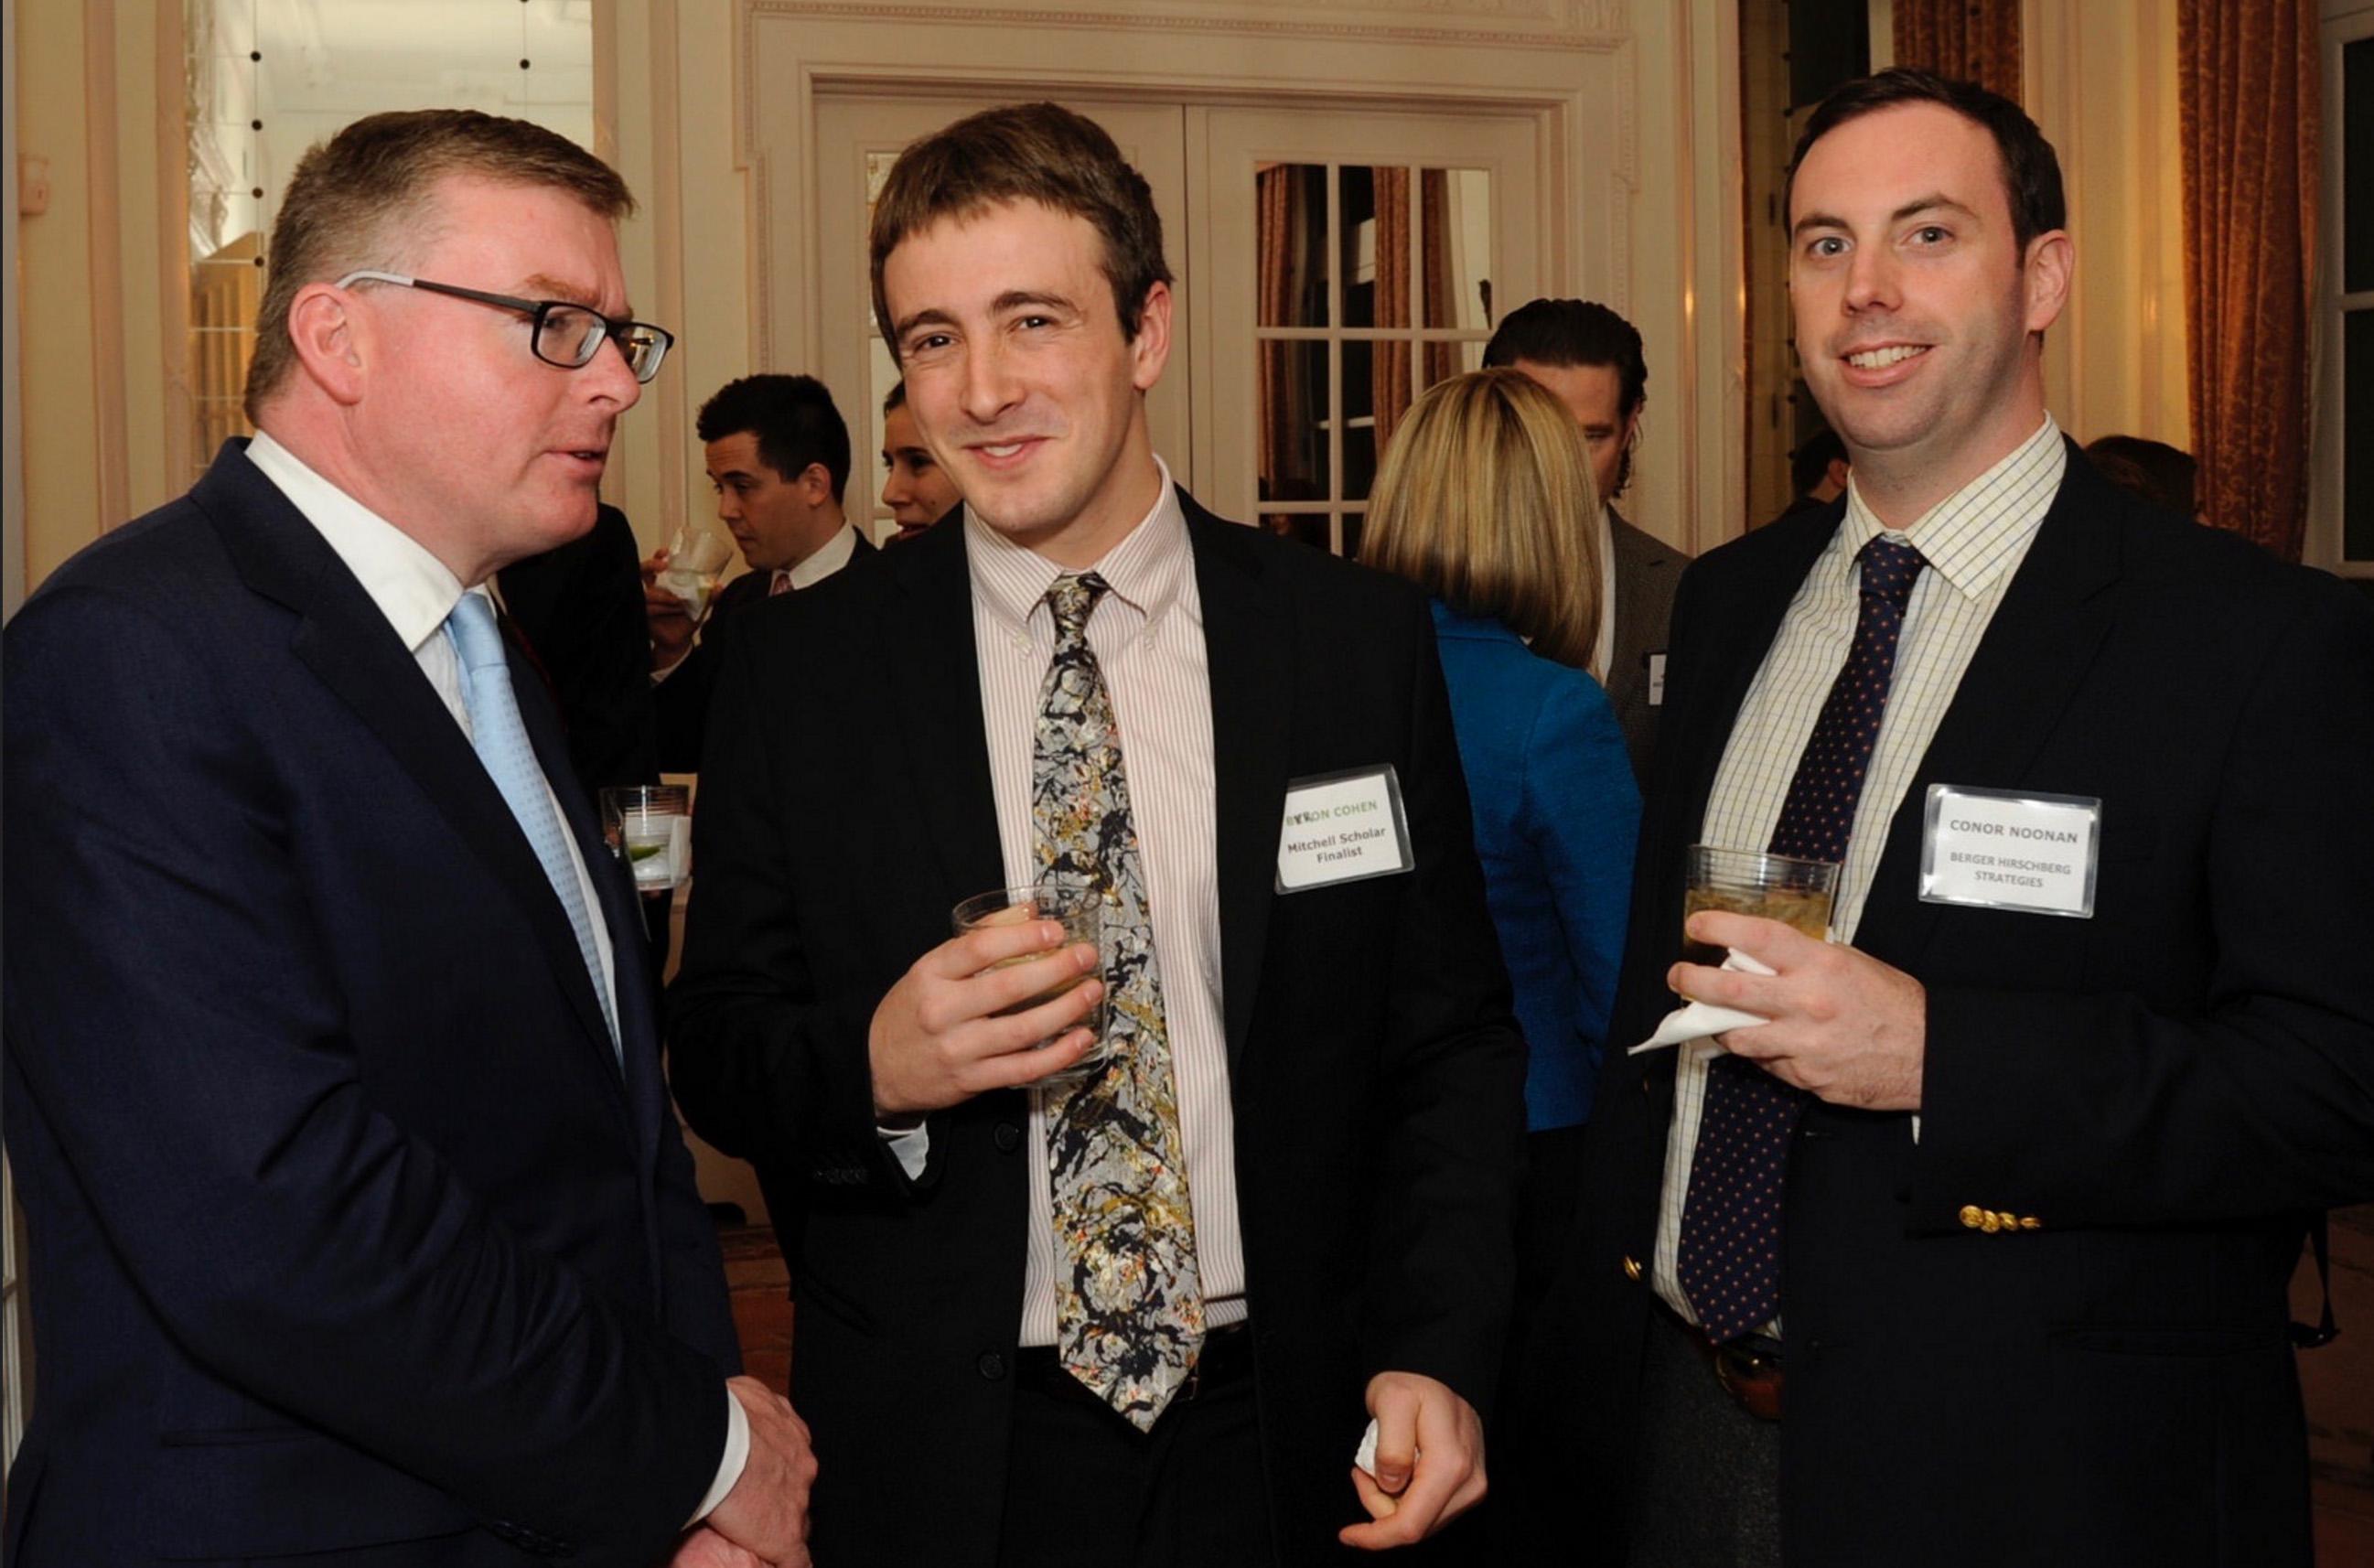 Michael Lonergan, Byron Cohen and Conor Noonan